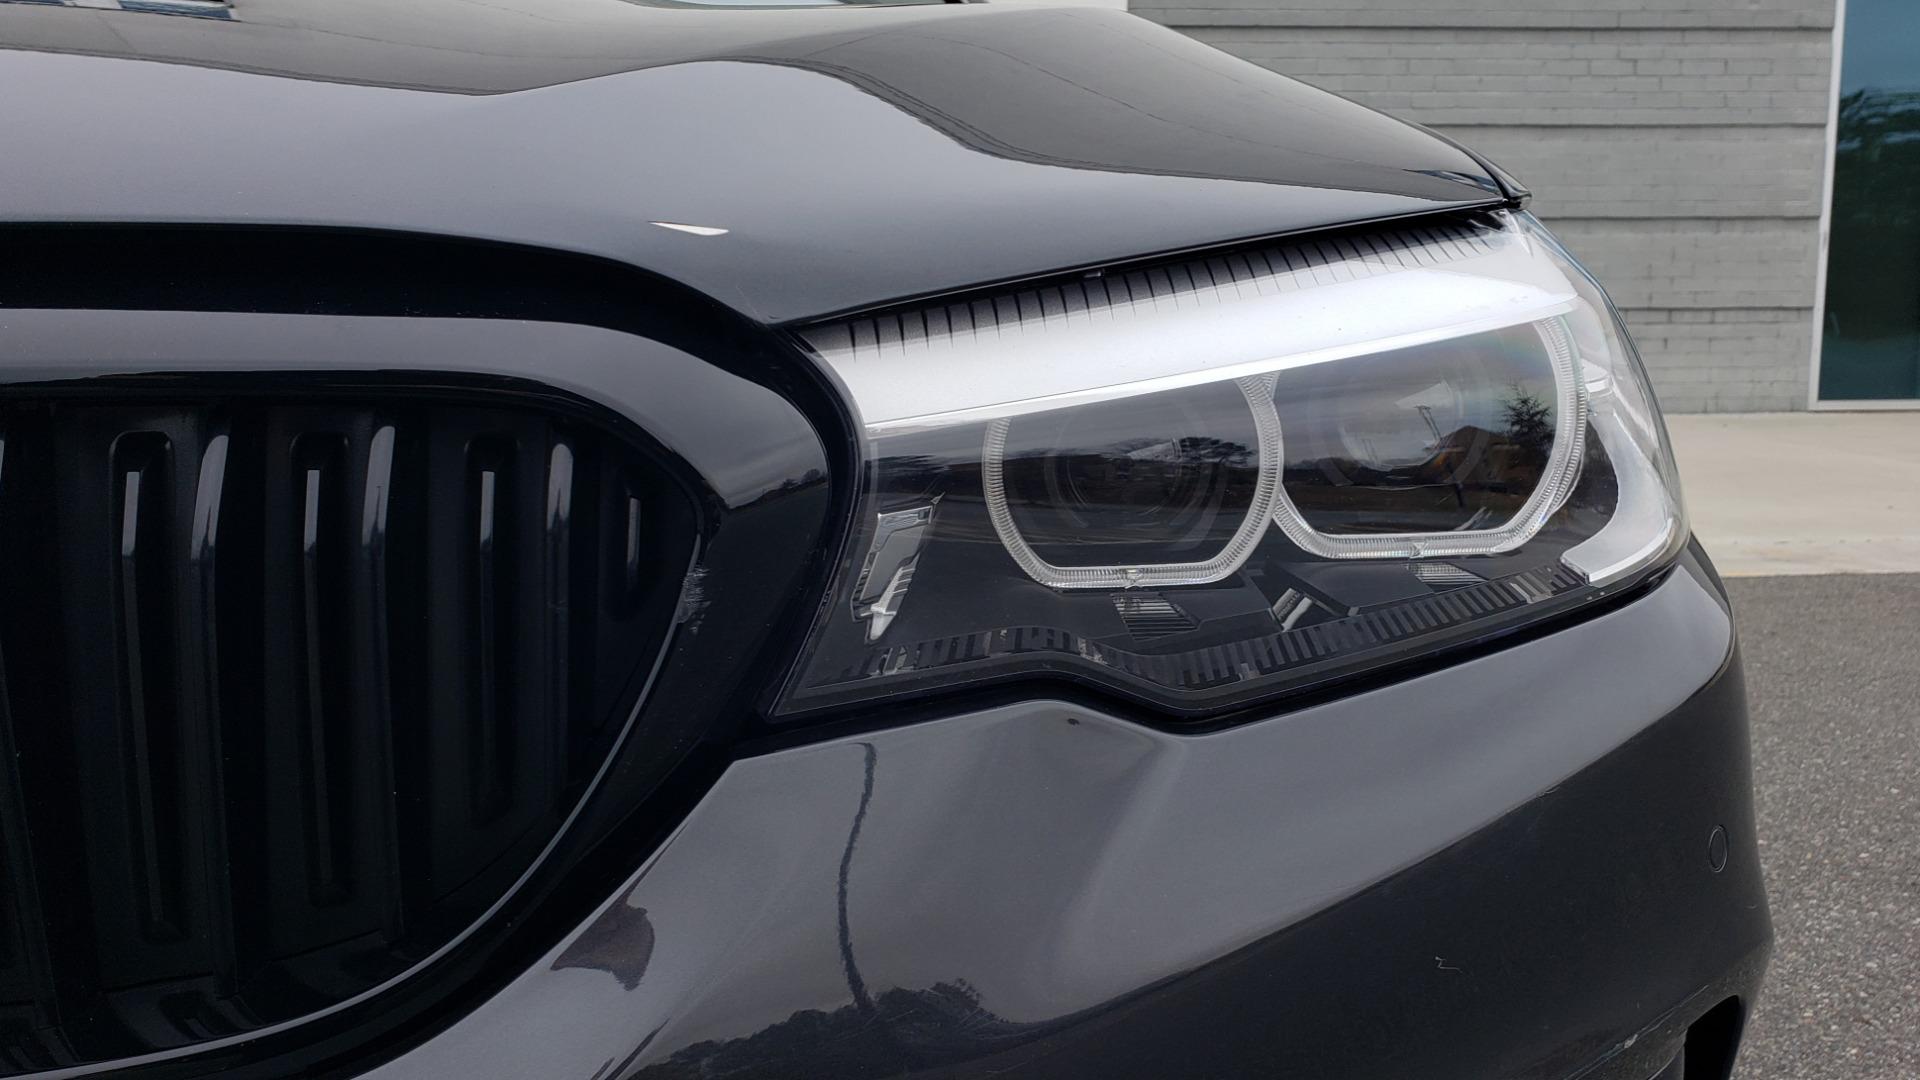 Used 2017 BMW 5 SERIES 530IXDRIVE / PREM PKG / DRVR ASST PLUS / CLD WTHR / APPLE CARPLAY for sale $30,595 at Formula Imports in Charlotte NC 28227 21